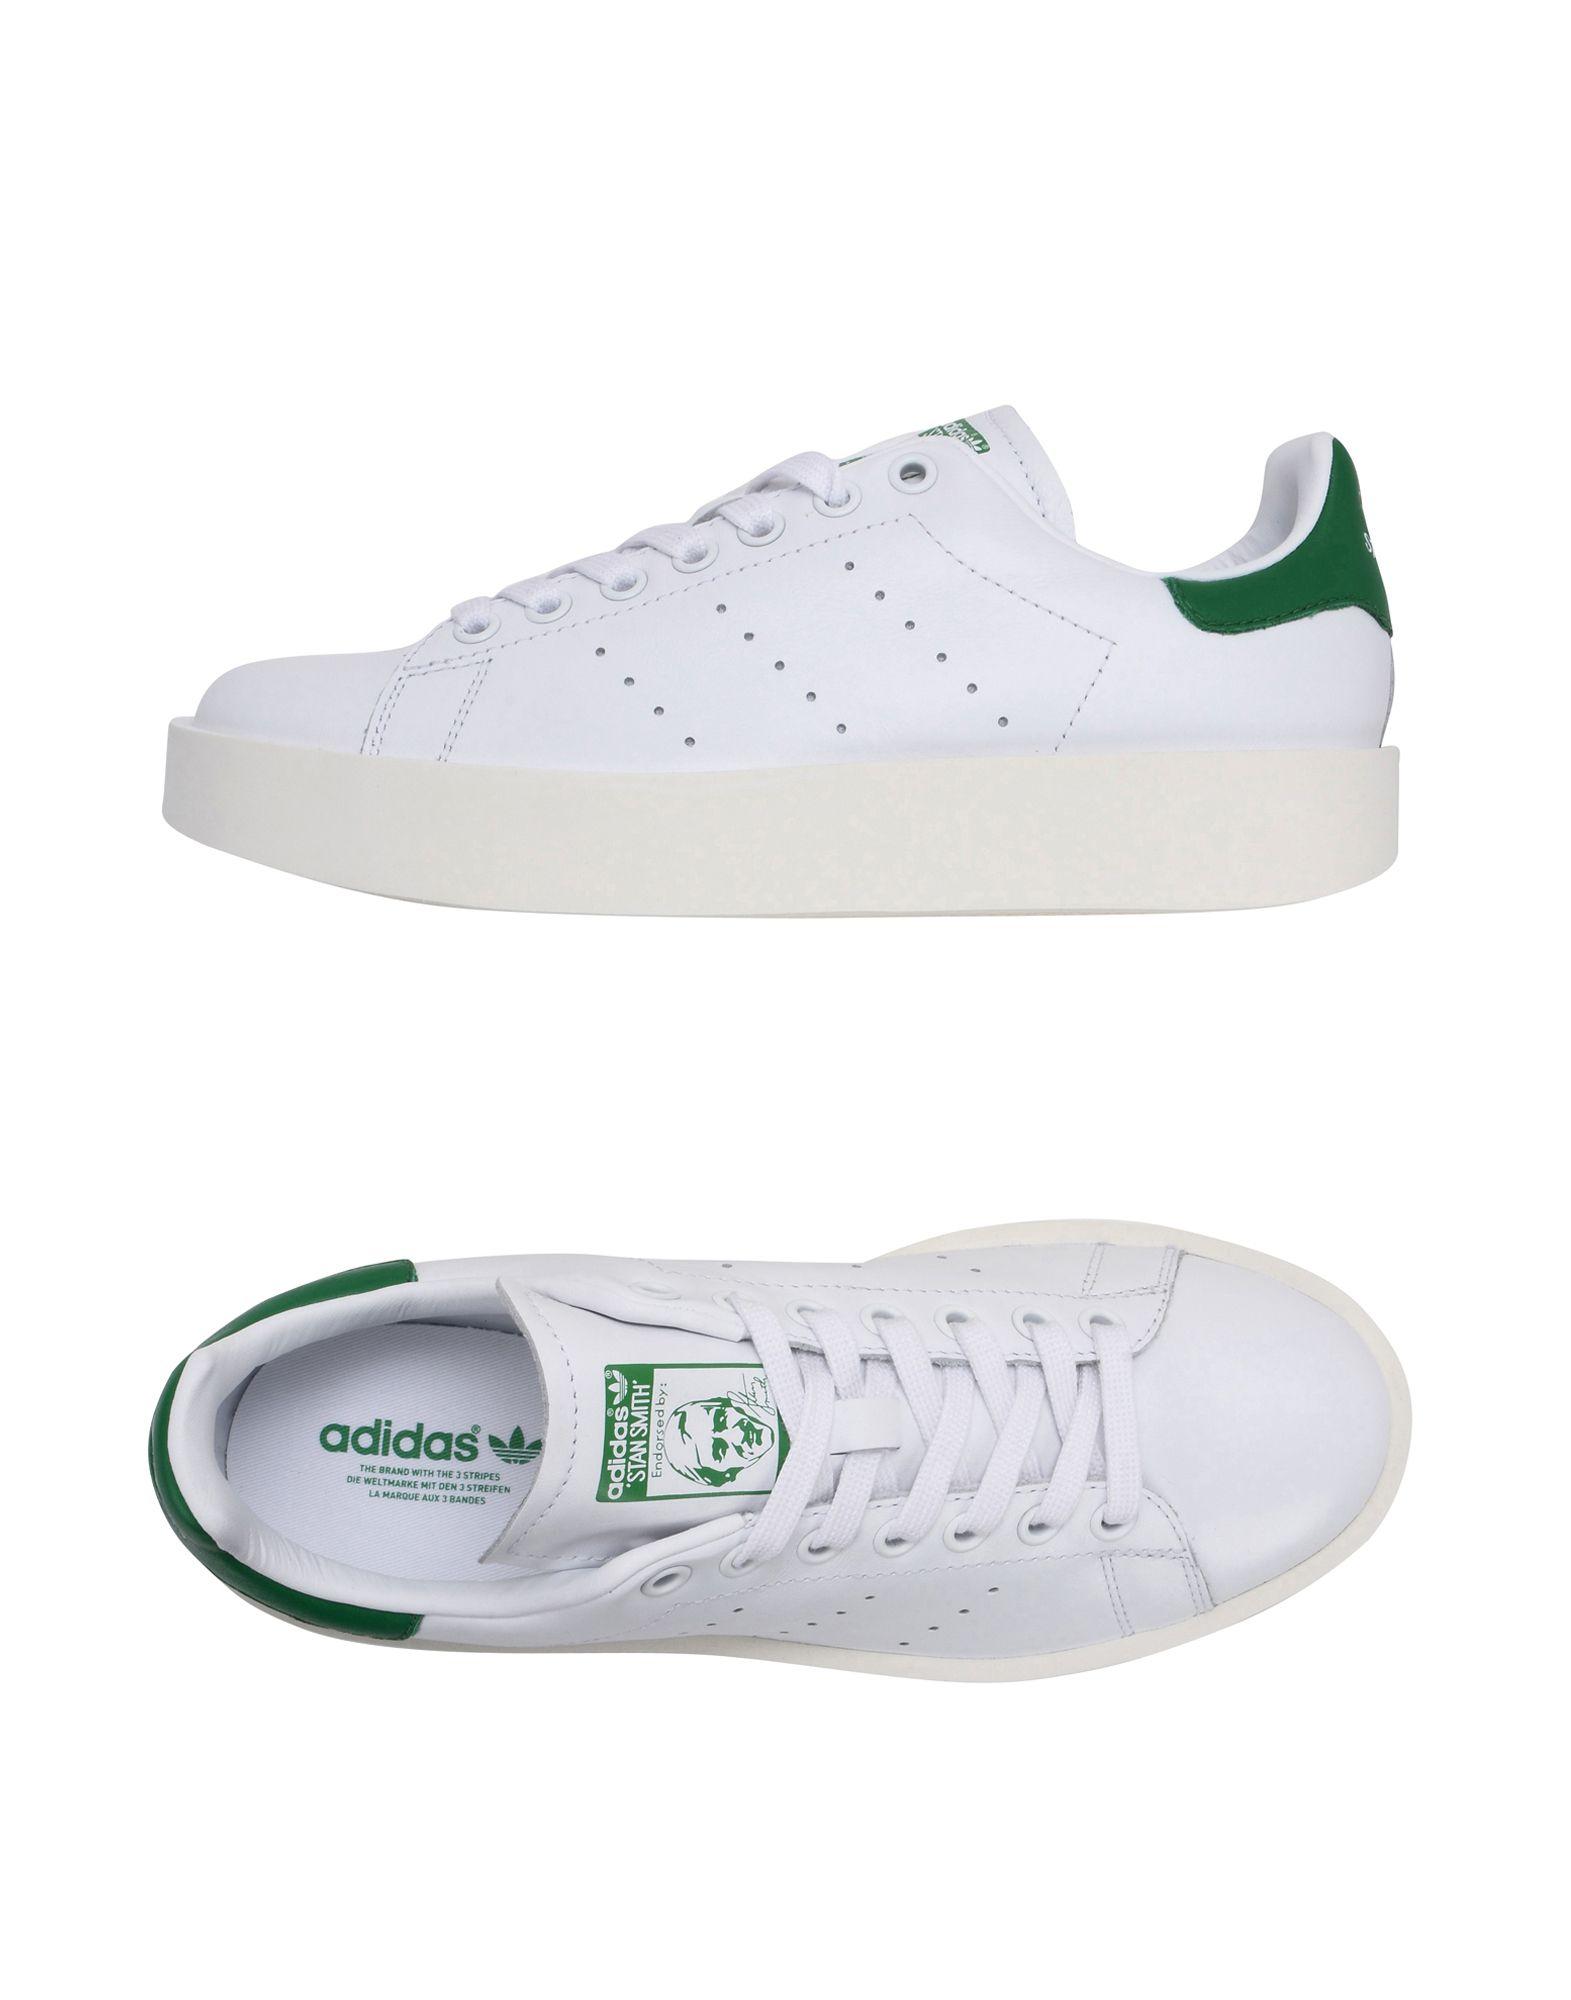 Sneakers Adidas Originals Stan Smith Bold W - Femme - Sneakers Adidas Originals sur